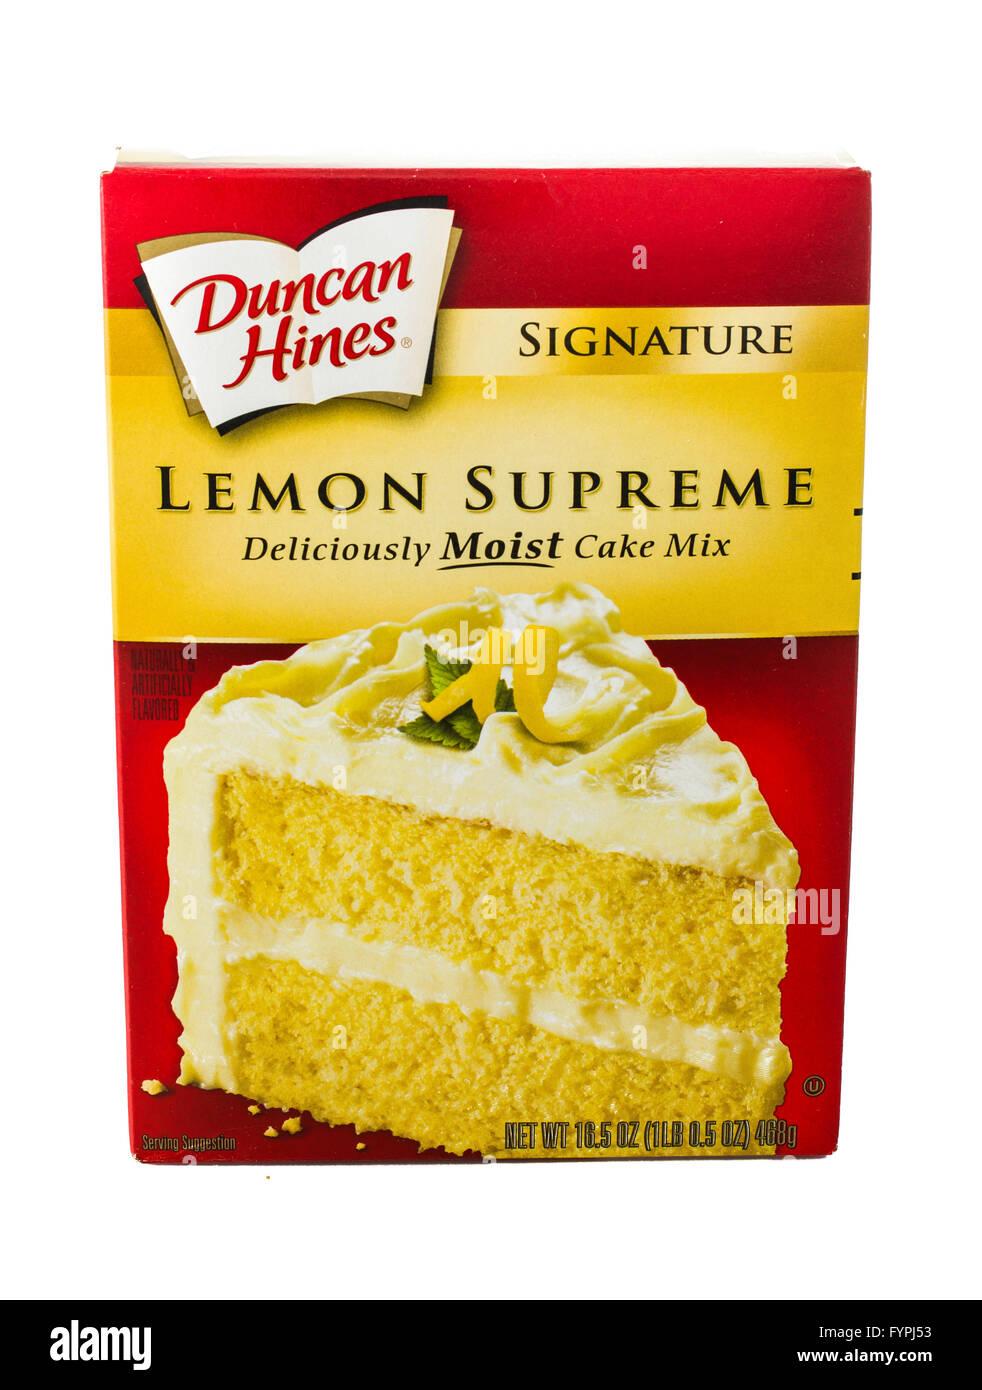 Winneconne, WI - 5 February 2015: Box of Duncan Hines Lemon Supreme cake mix. Stock Photo